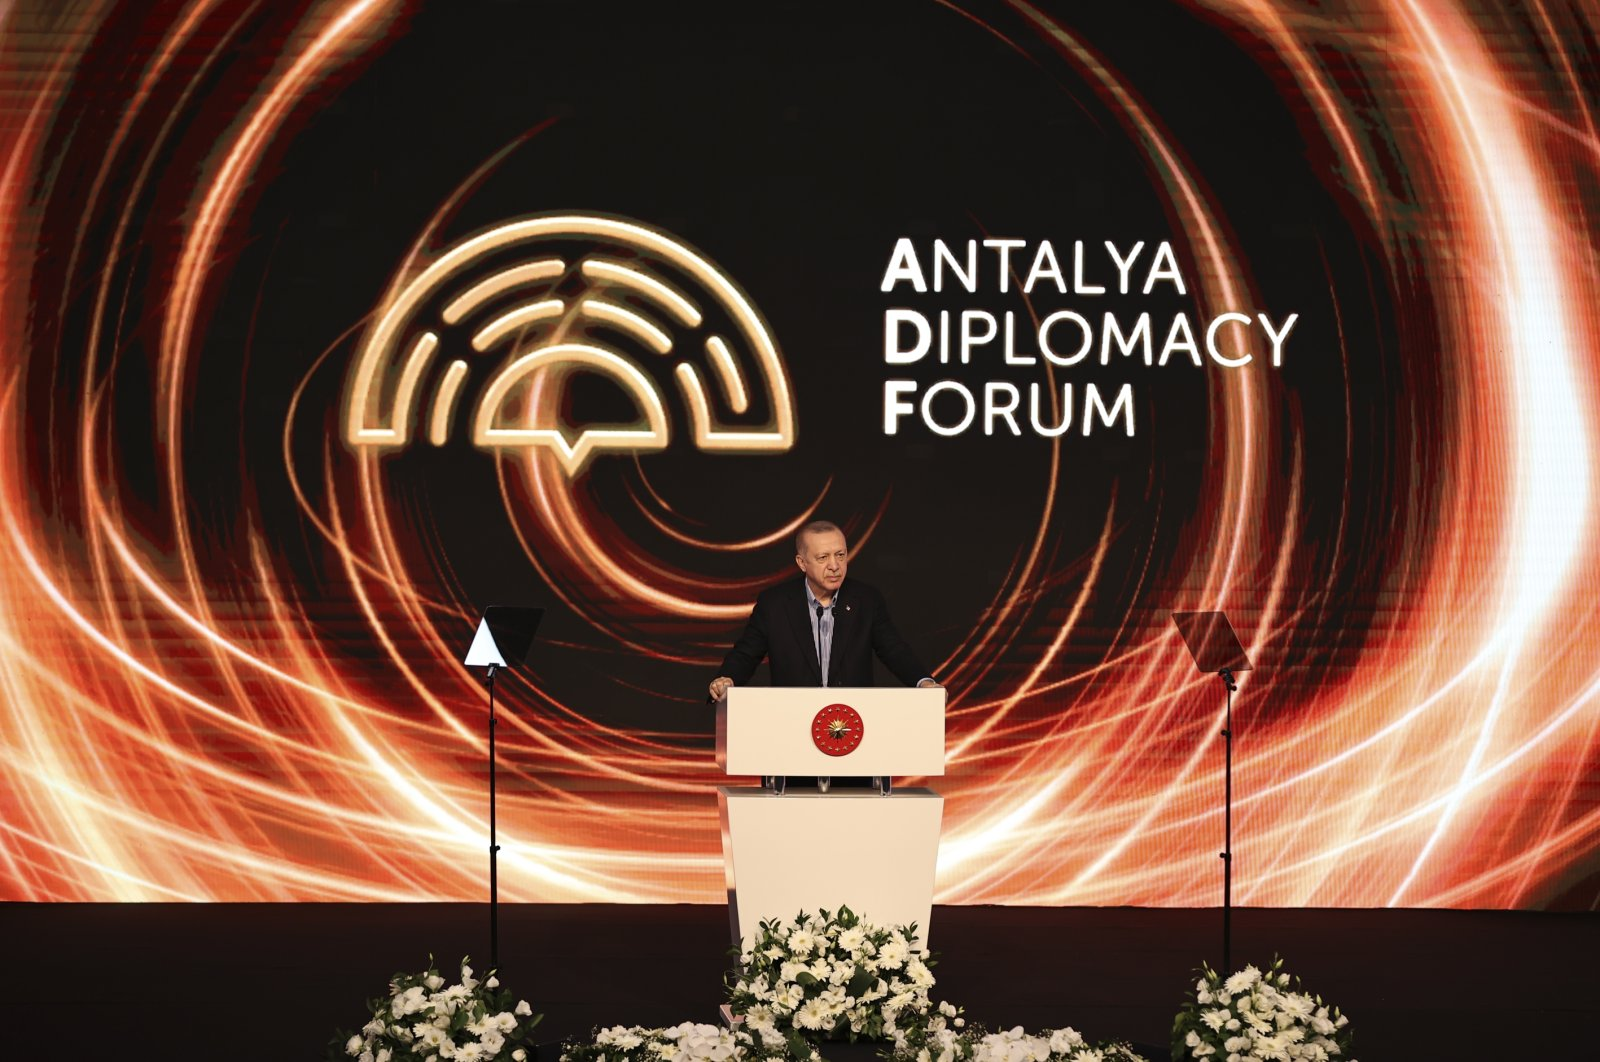 President Recep Tayyip Erdoğan speaks at the Antalya Diplomacy Forum in Antalya, Turkey, June 18, 2021. (AA Photo)